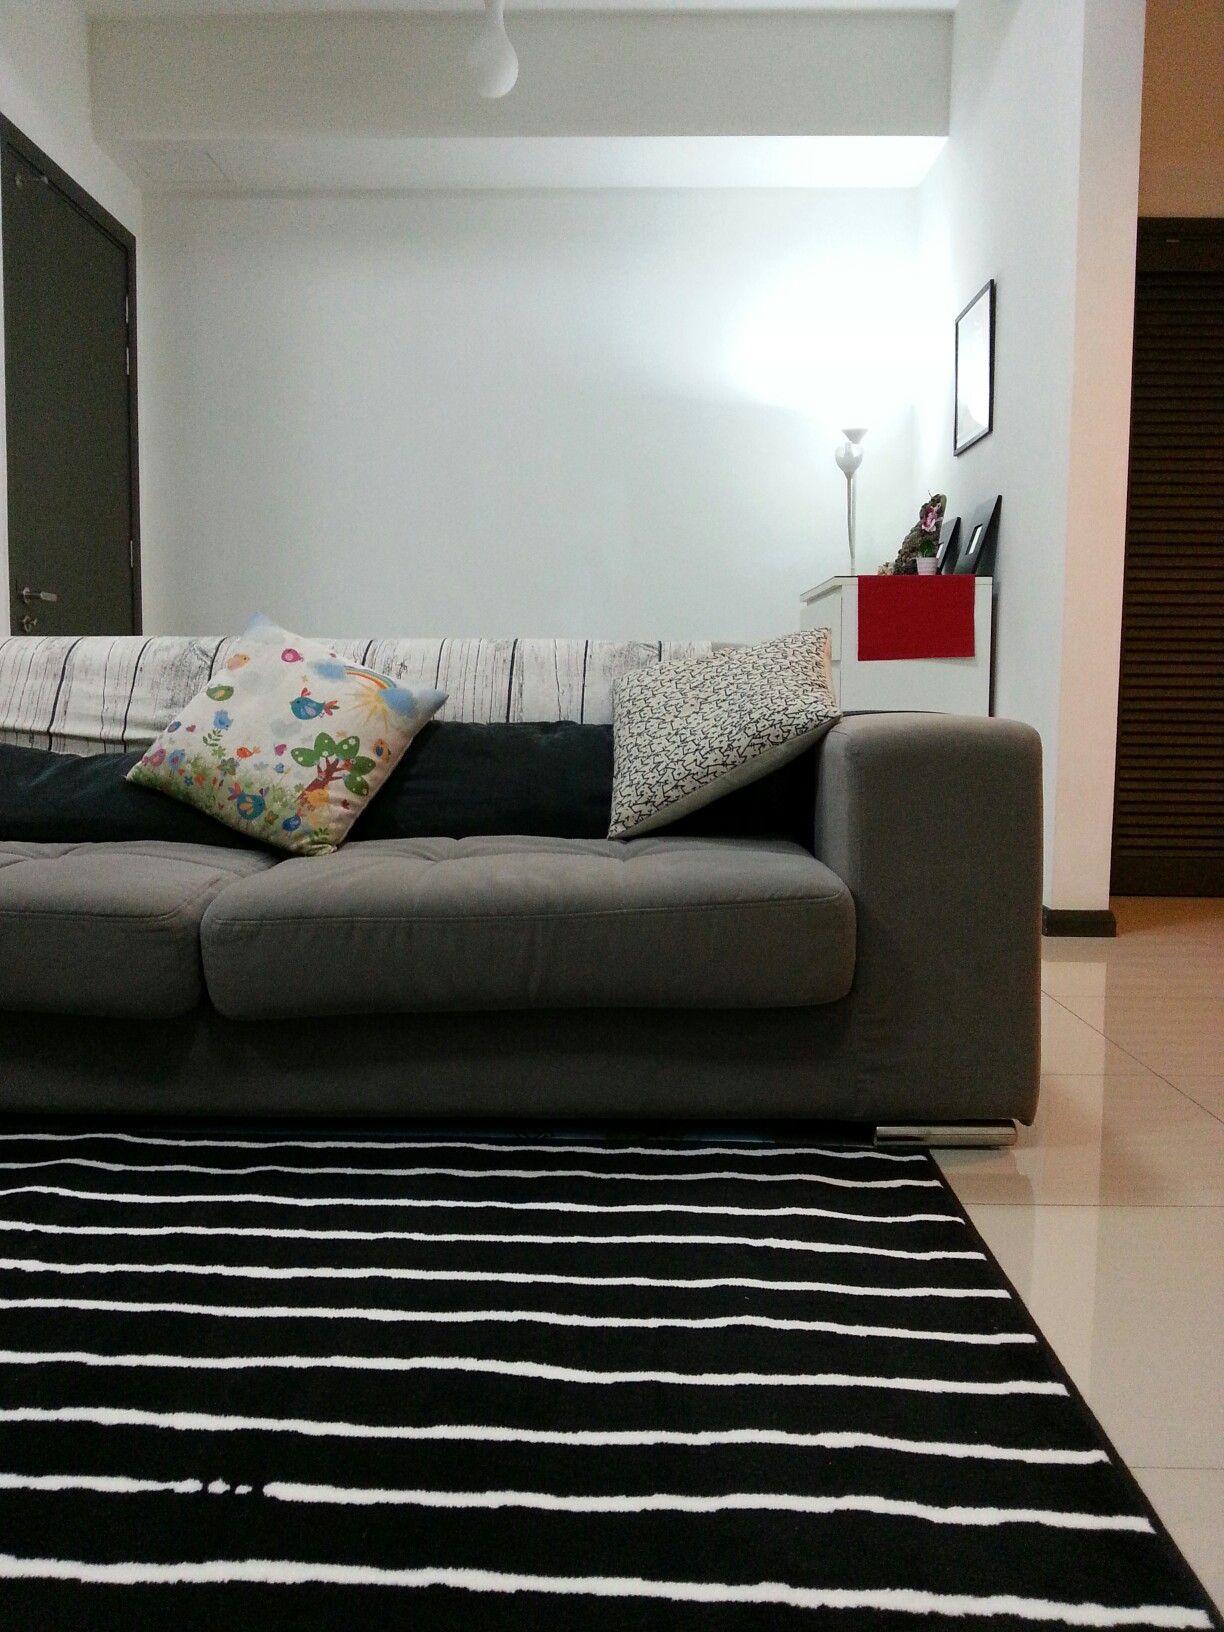 ikea mobile home - Google Search | Home, Living room ...